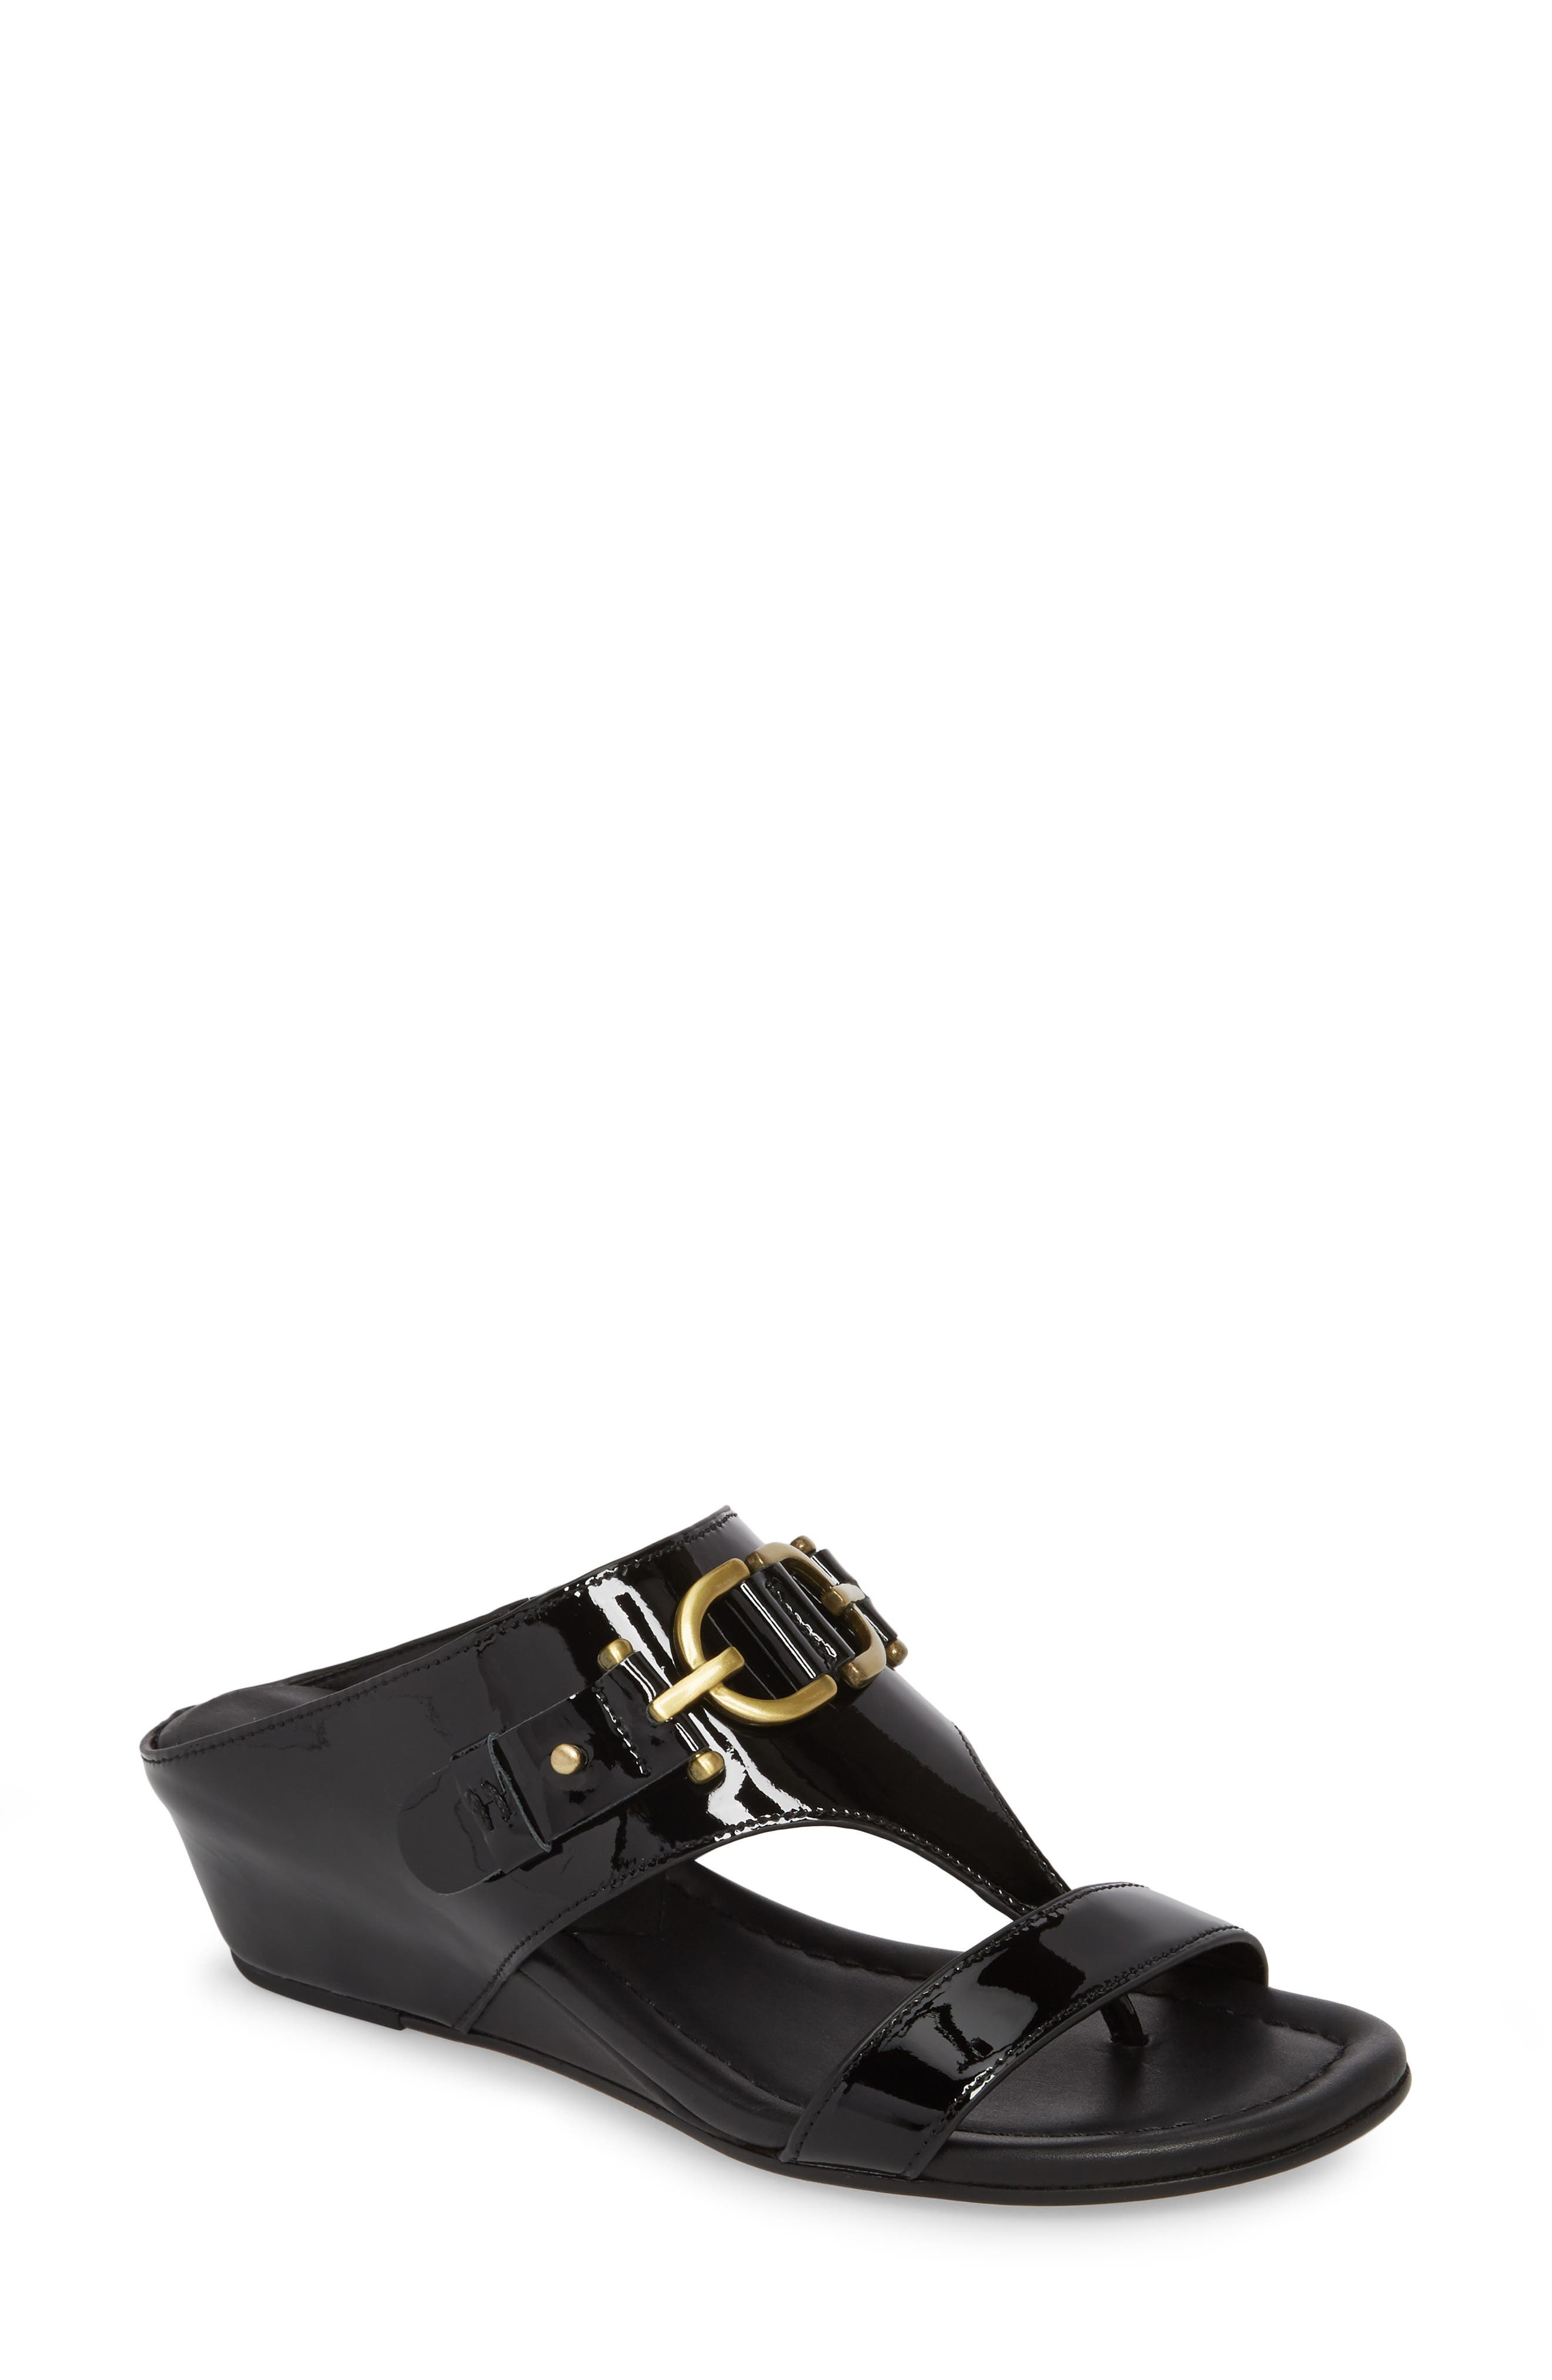 Dayna Wedge Sandal,                         Main,                         color, 001